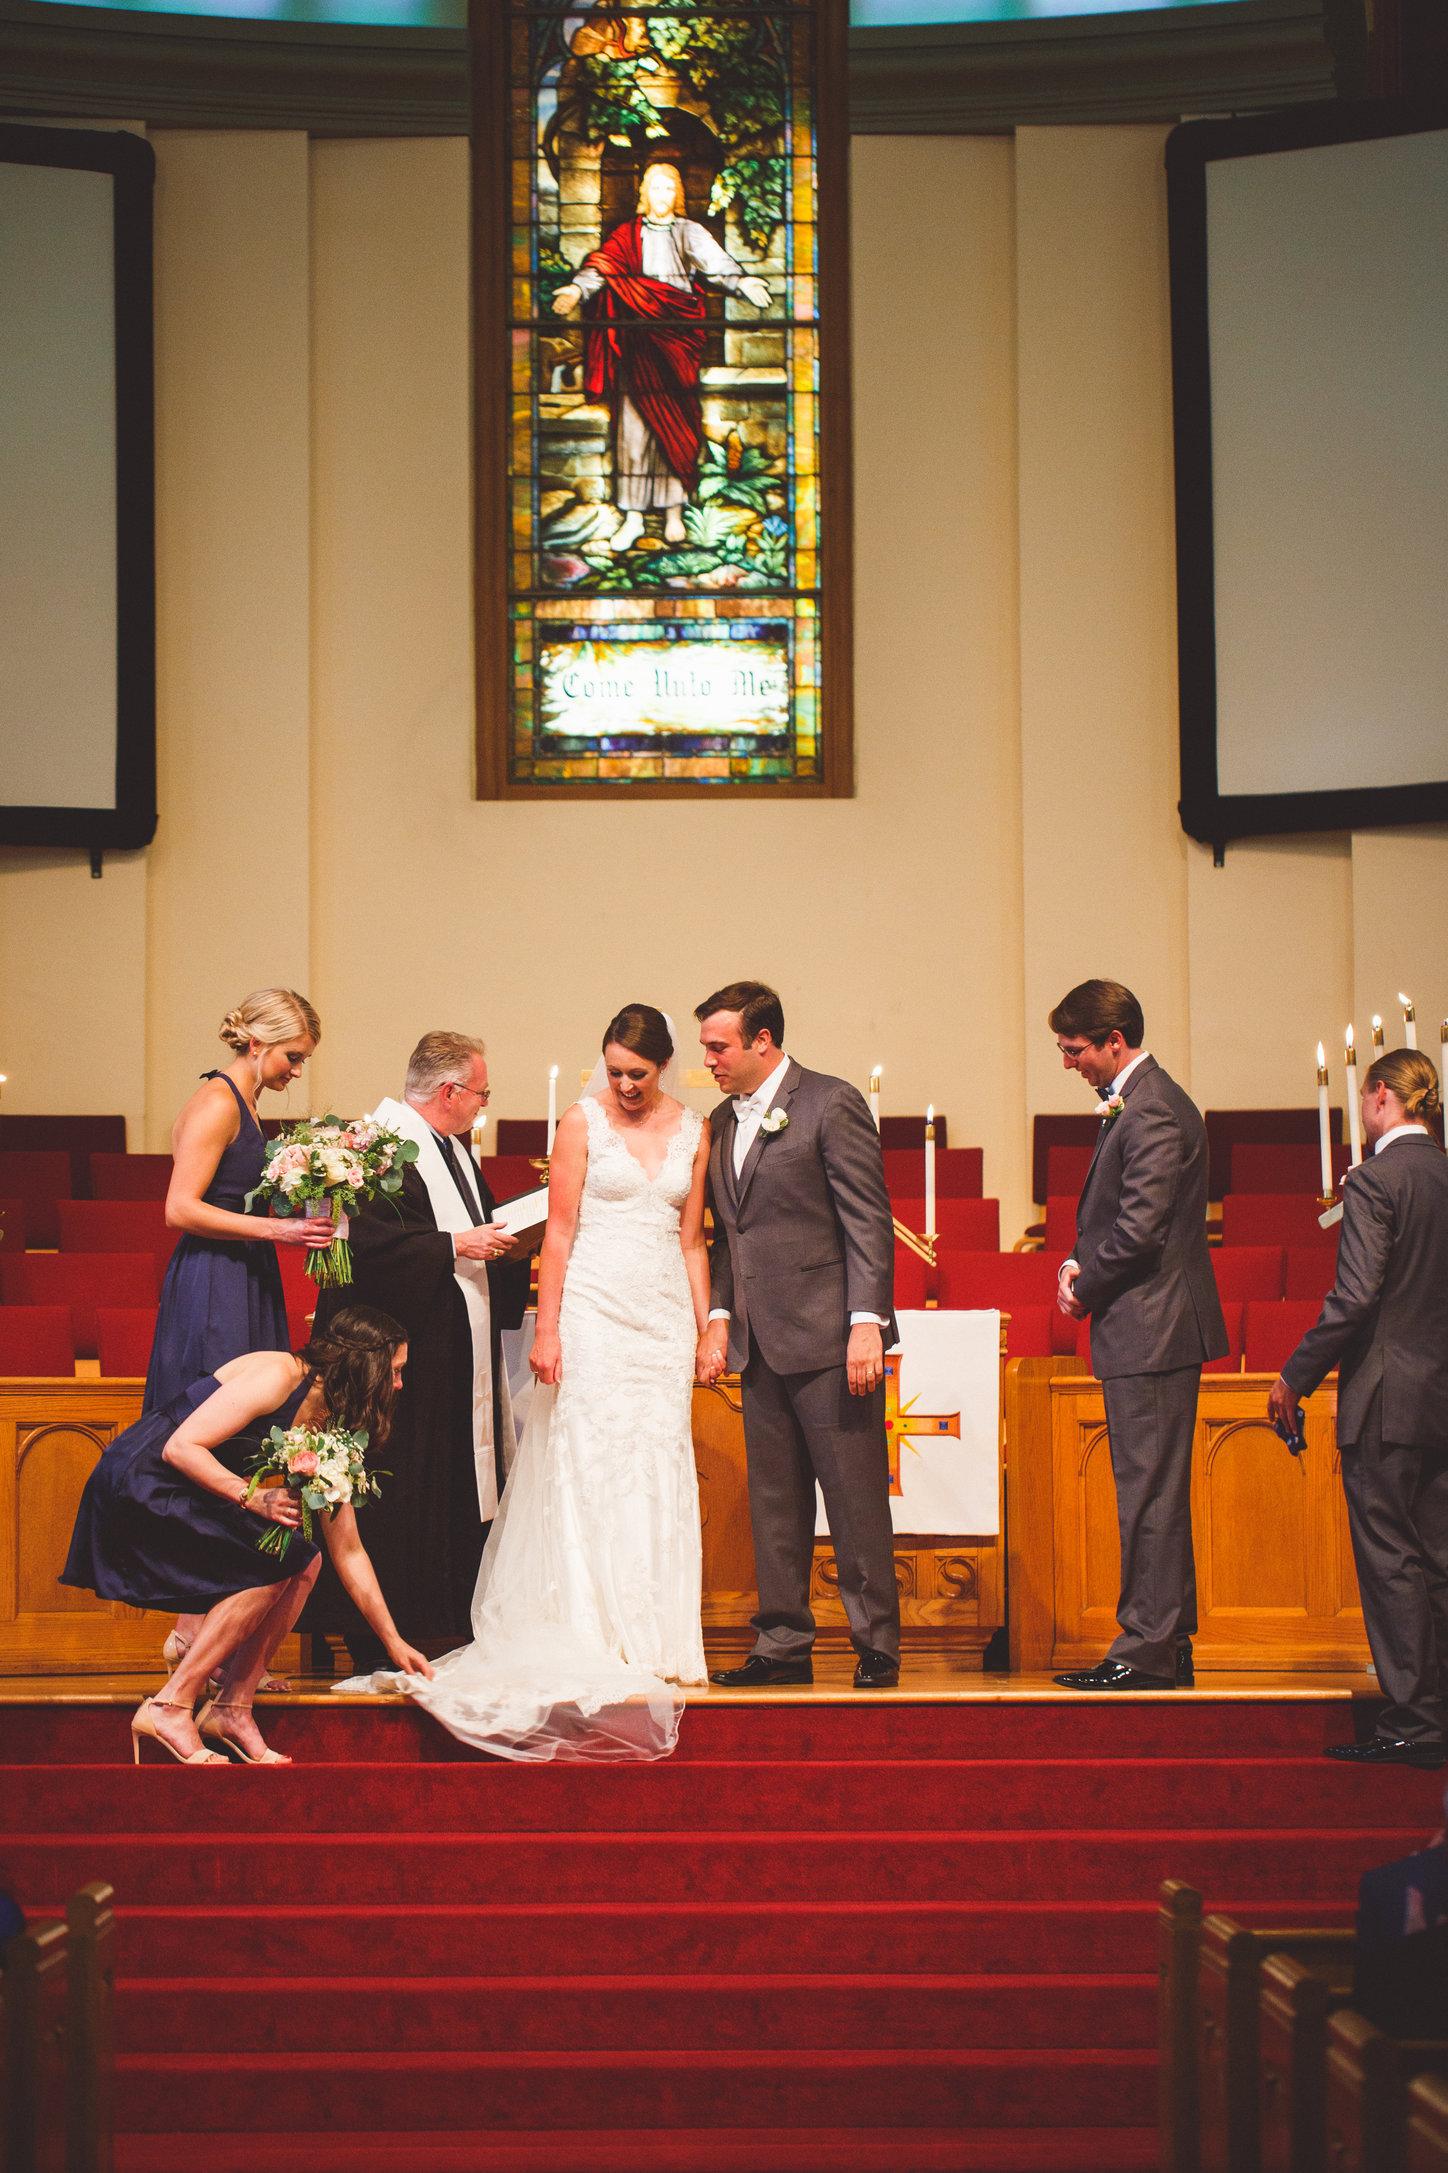 SandC-wedding-226.jpg